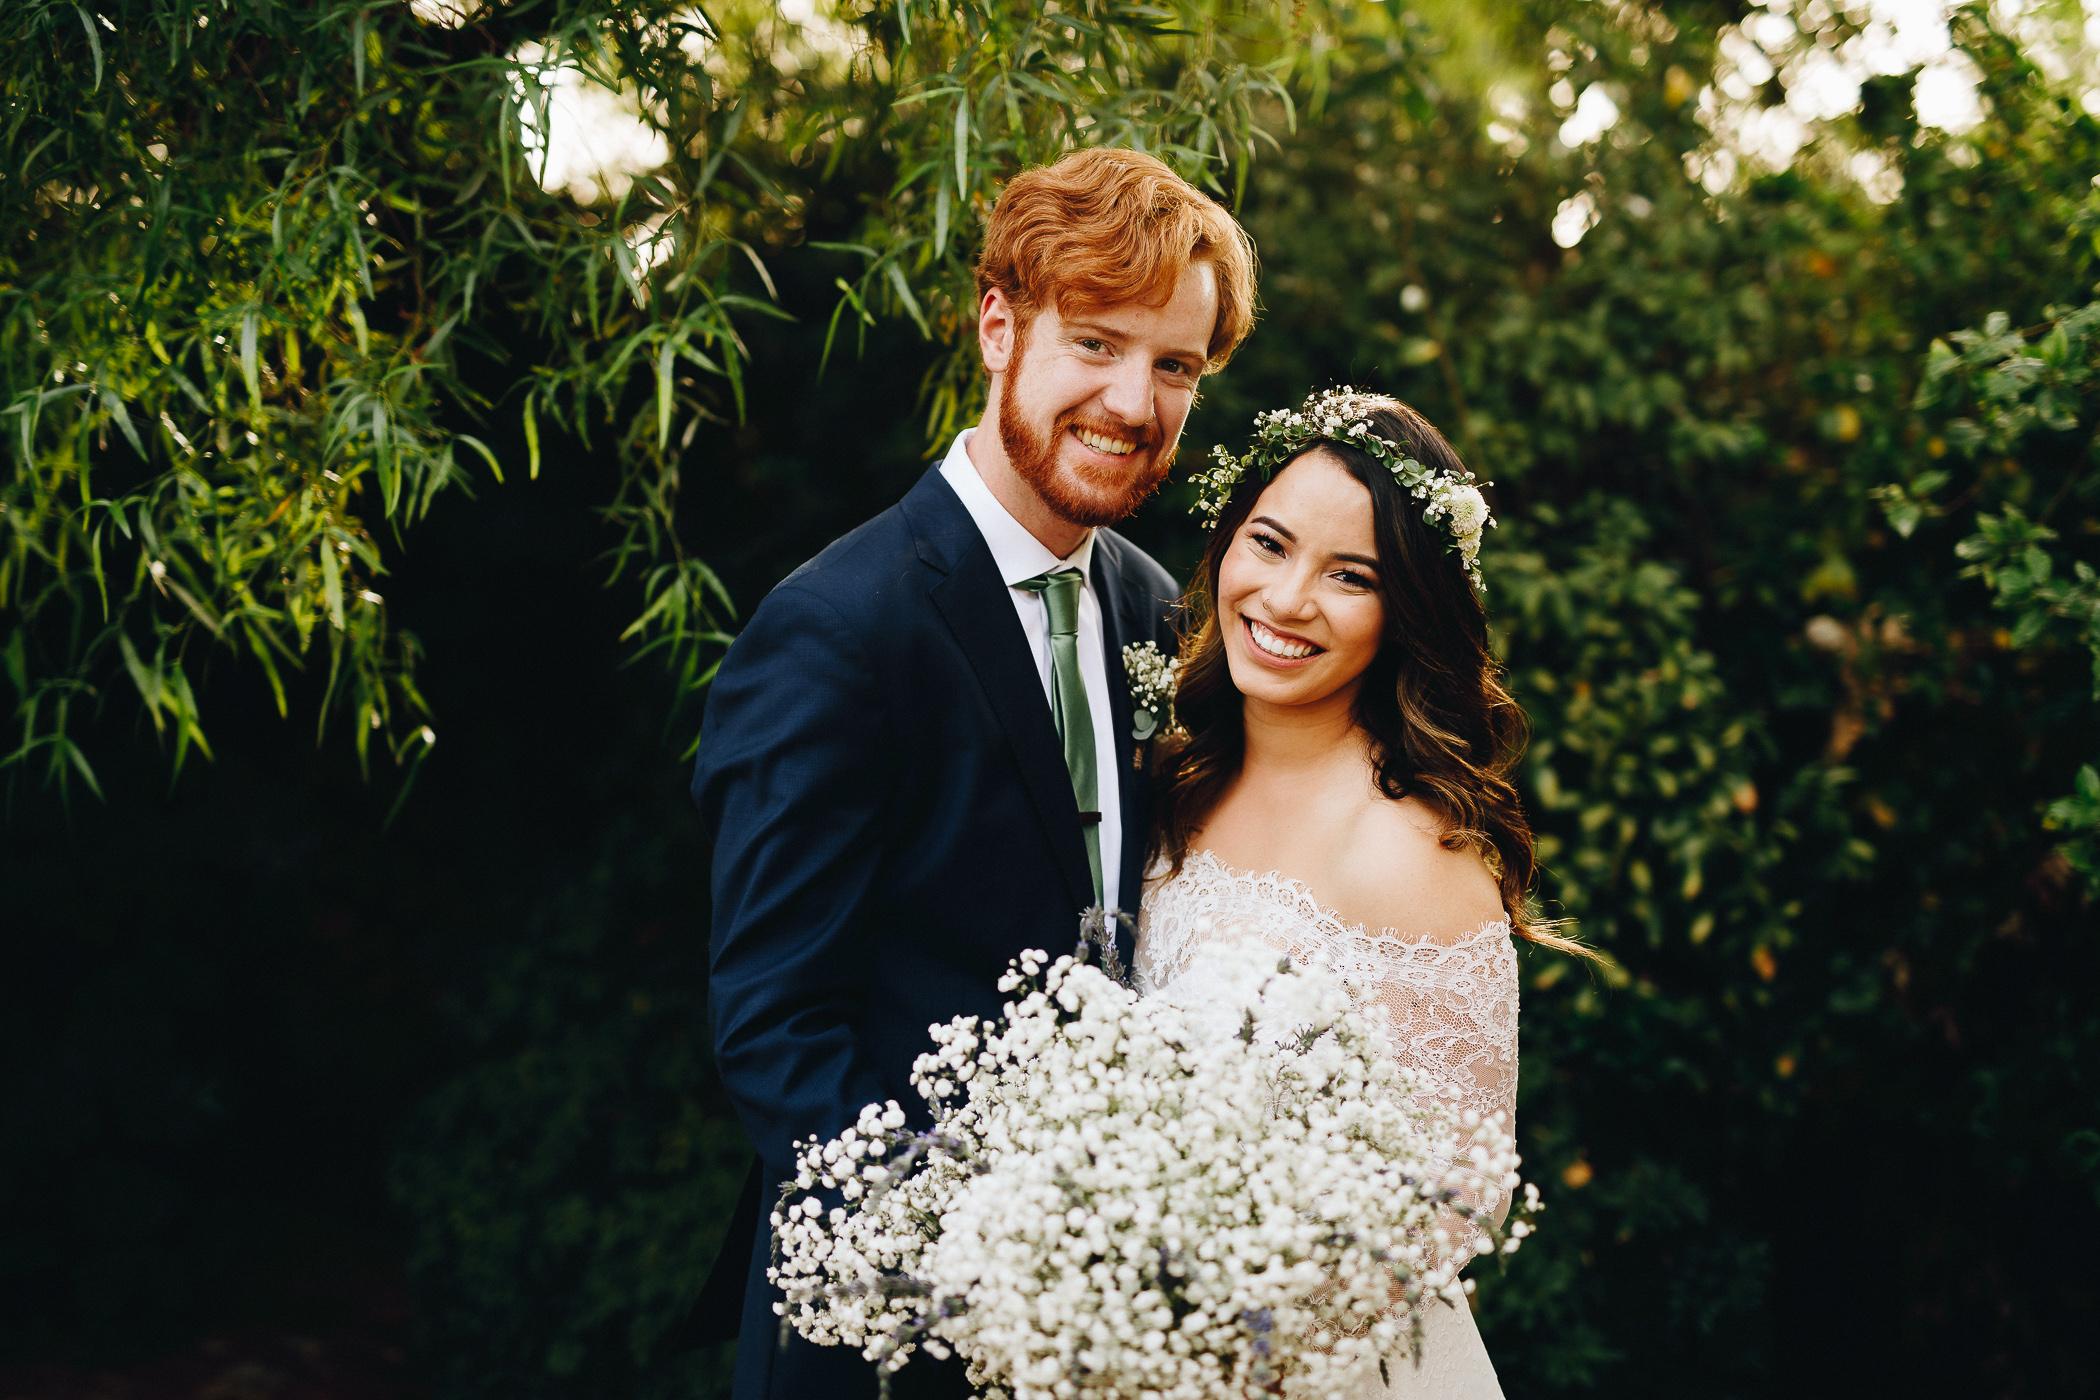 181104-Luxium-Weddings-Arizona-@matt__Le-Brandon-Kariana-Phoenix-Valley-Garden-Center-1079.jpg